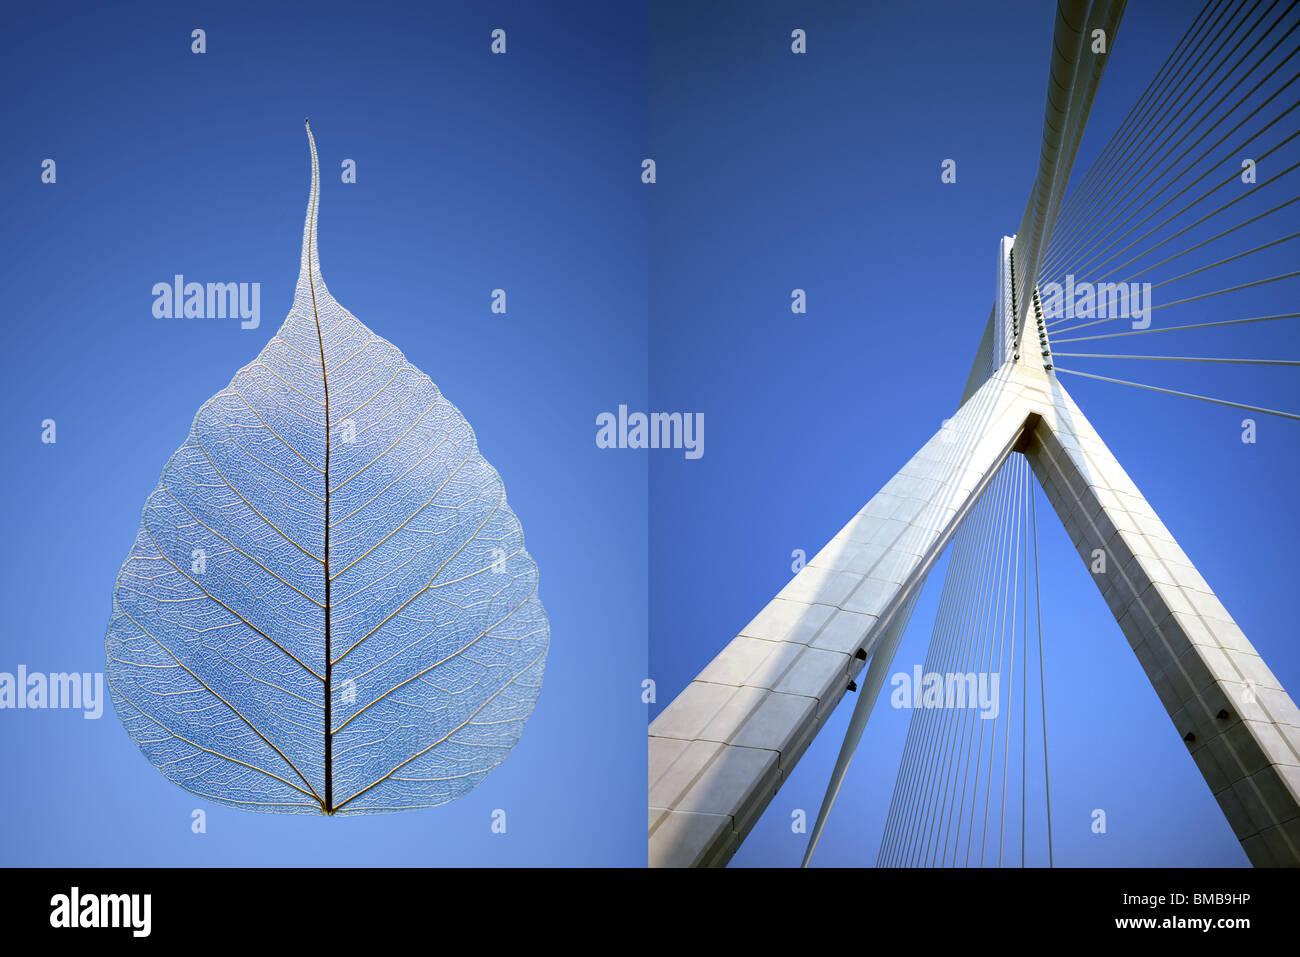 Hängebrücke in Nordwales gegenübergestellt Skelett Blatt gegen blauen Himmel Stockbild